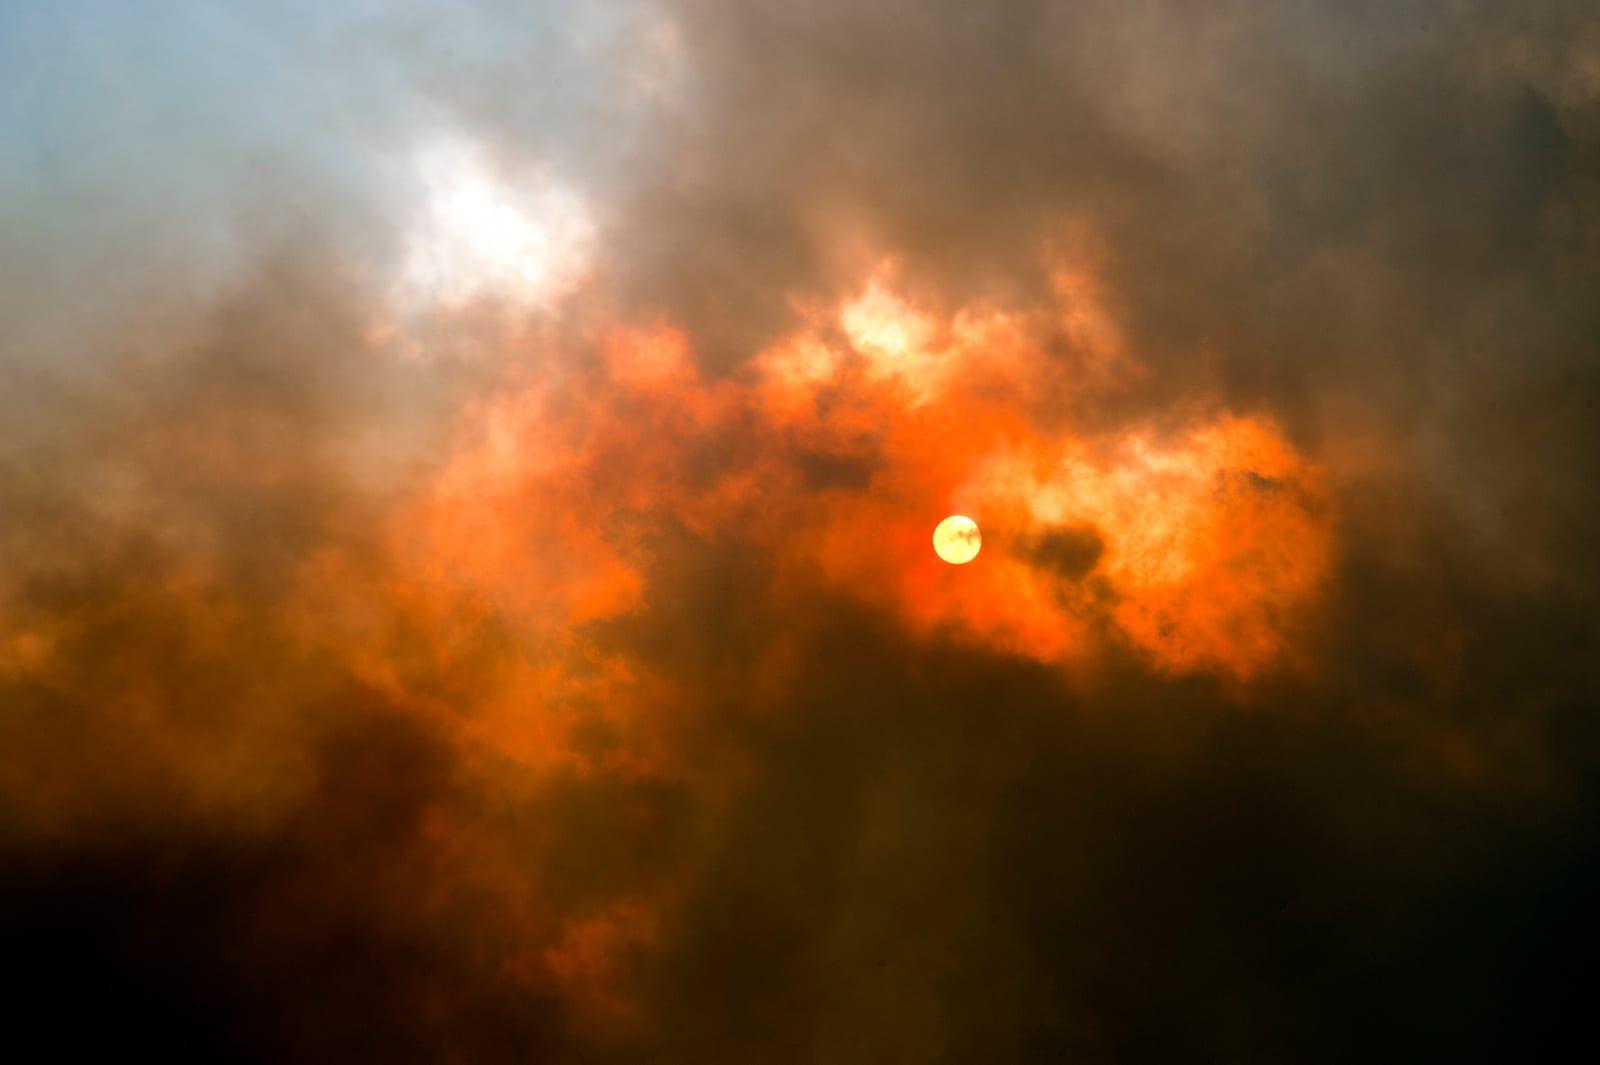 Colorado Wildfires High Park Fire Cloudy Smokey Sky Sun